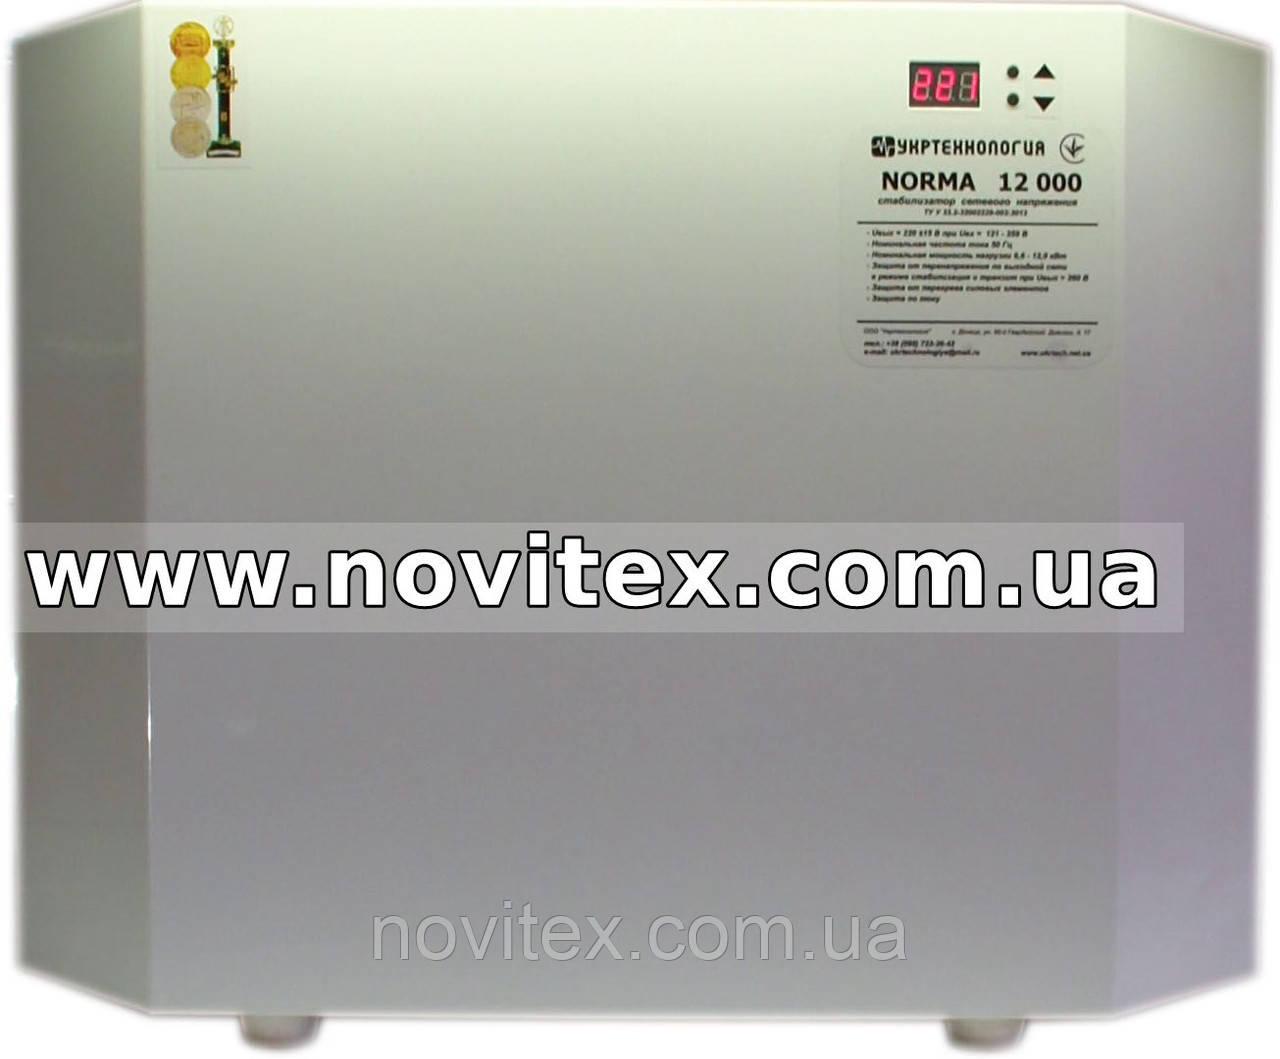 Стабилизатор Укртехнология НСН Norma 12000